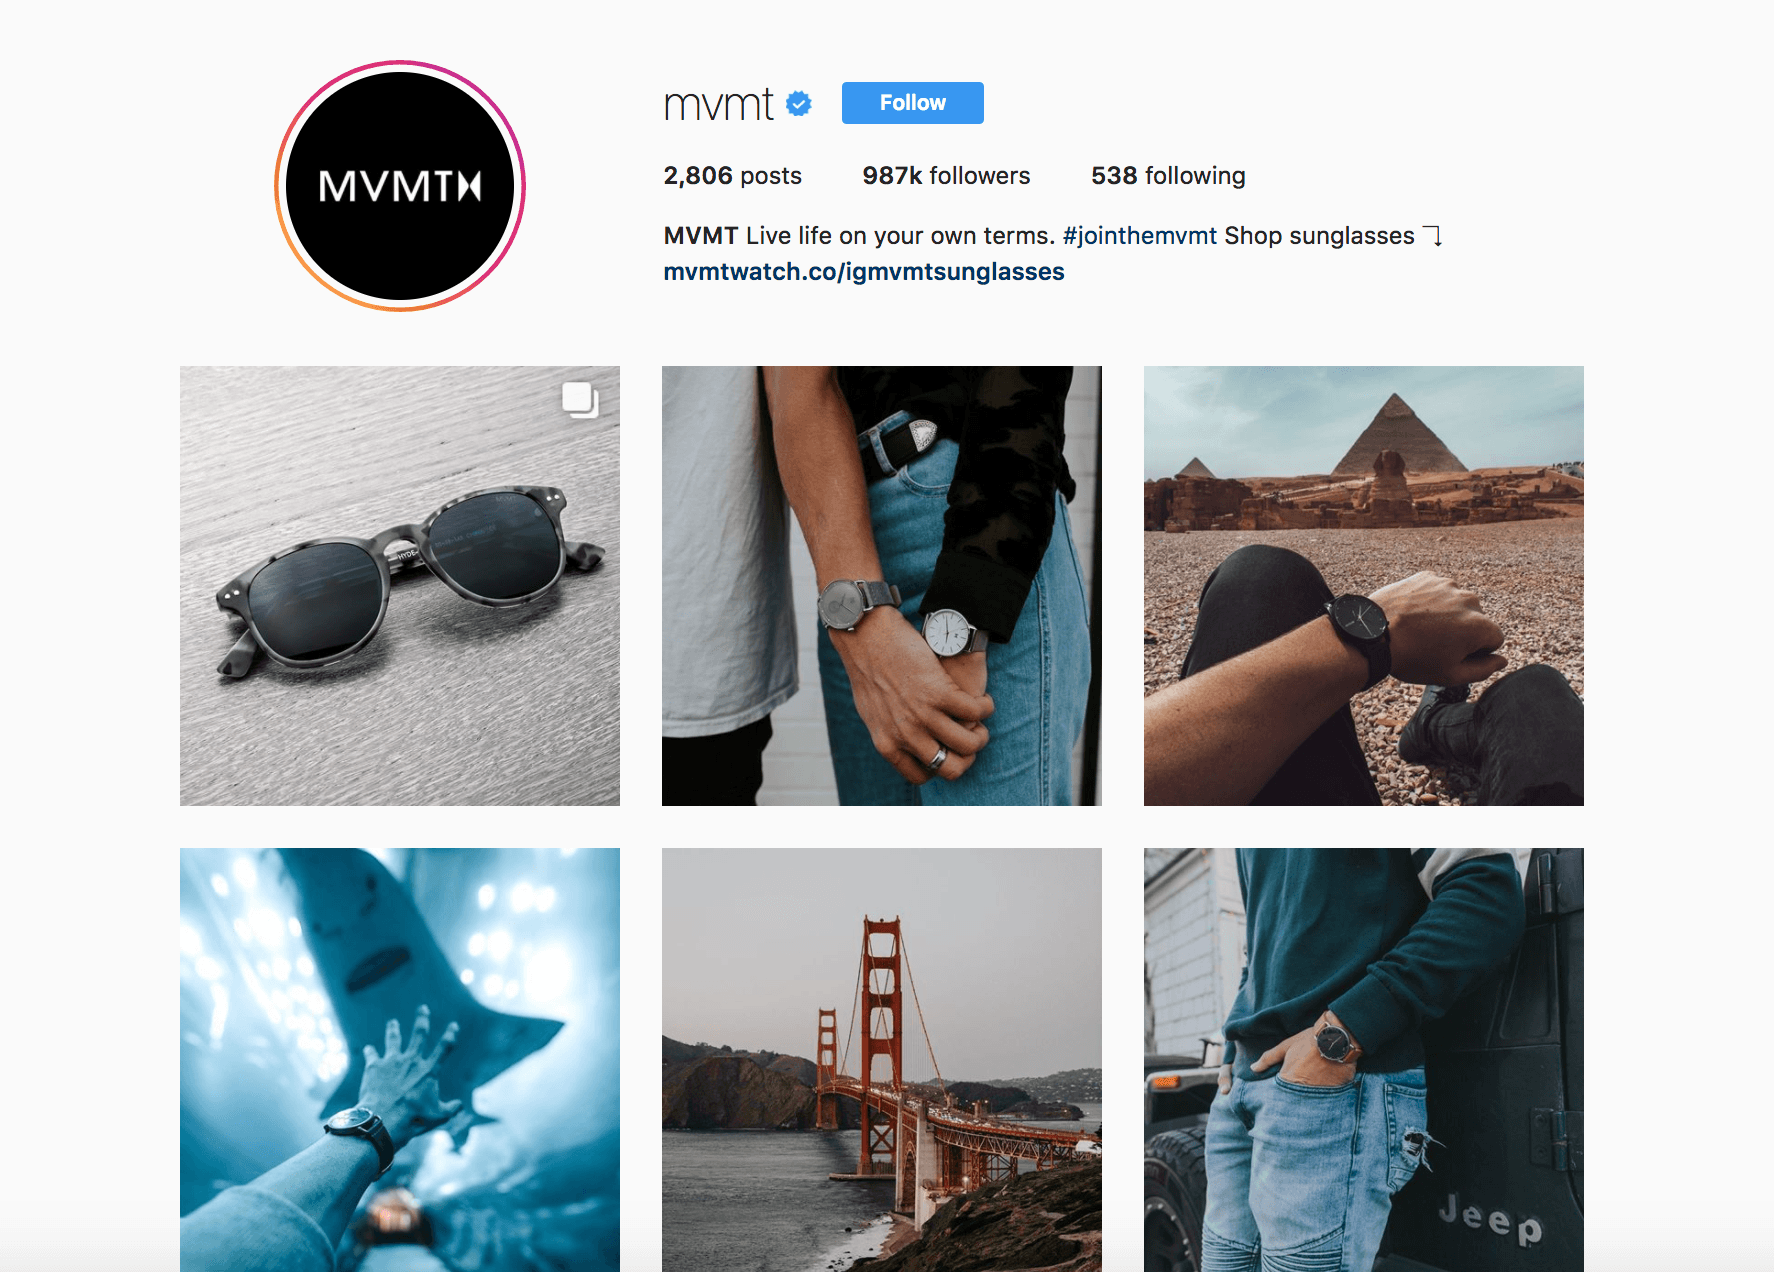 consistent instagram